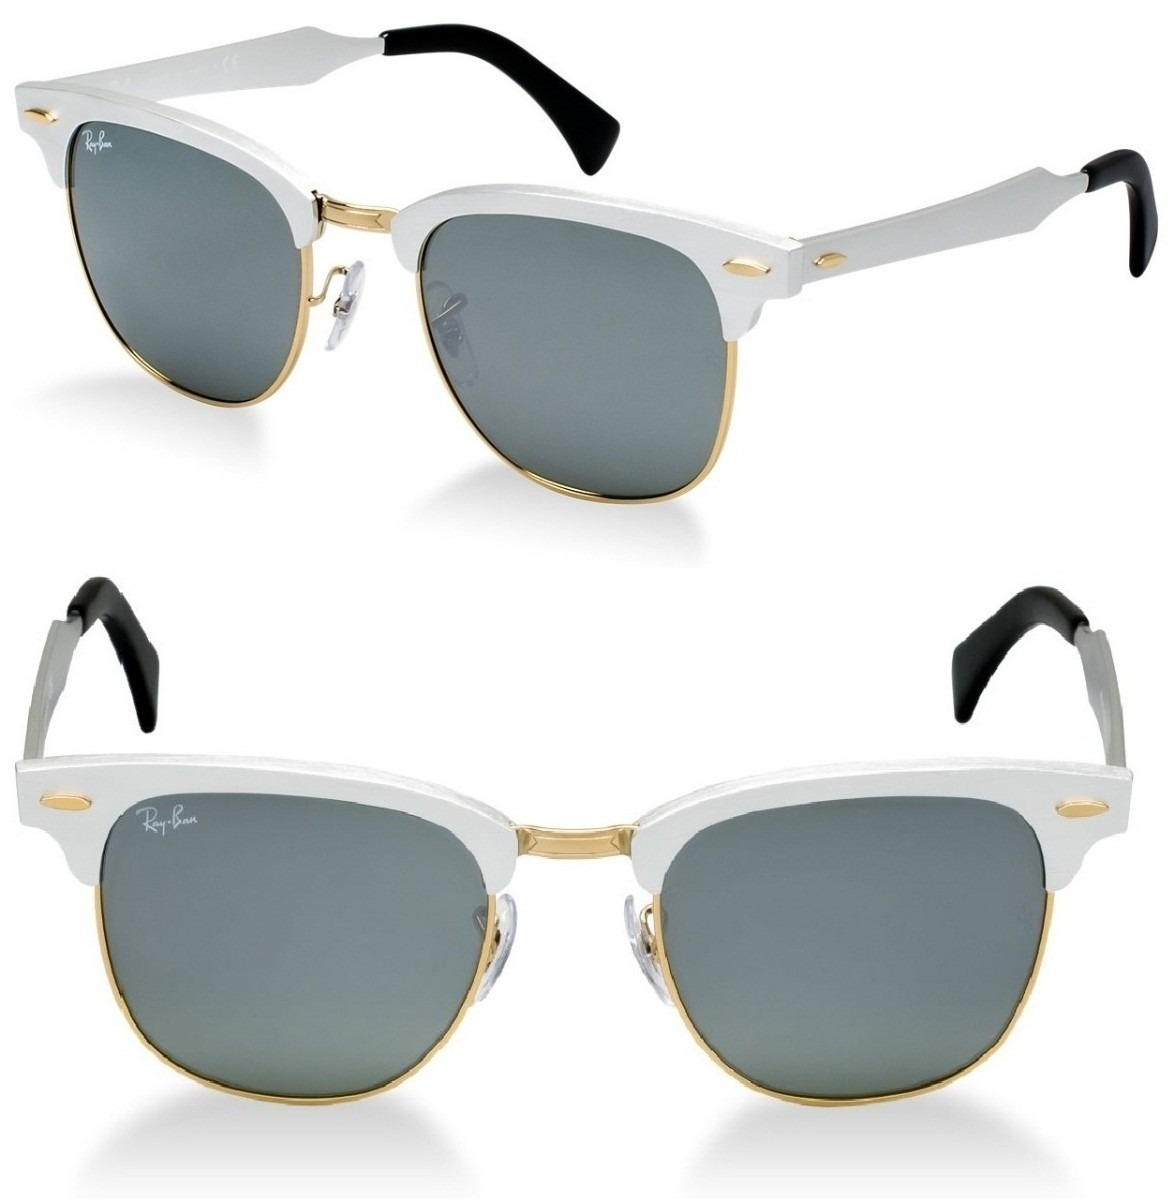 a3e75102b Valor Do Oculos Ray Ban Clubmaster | City of Kenmore, Washington